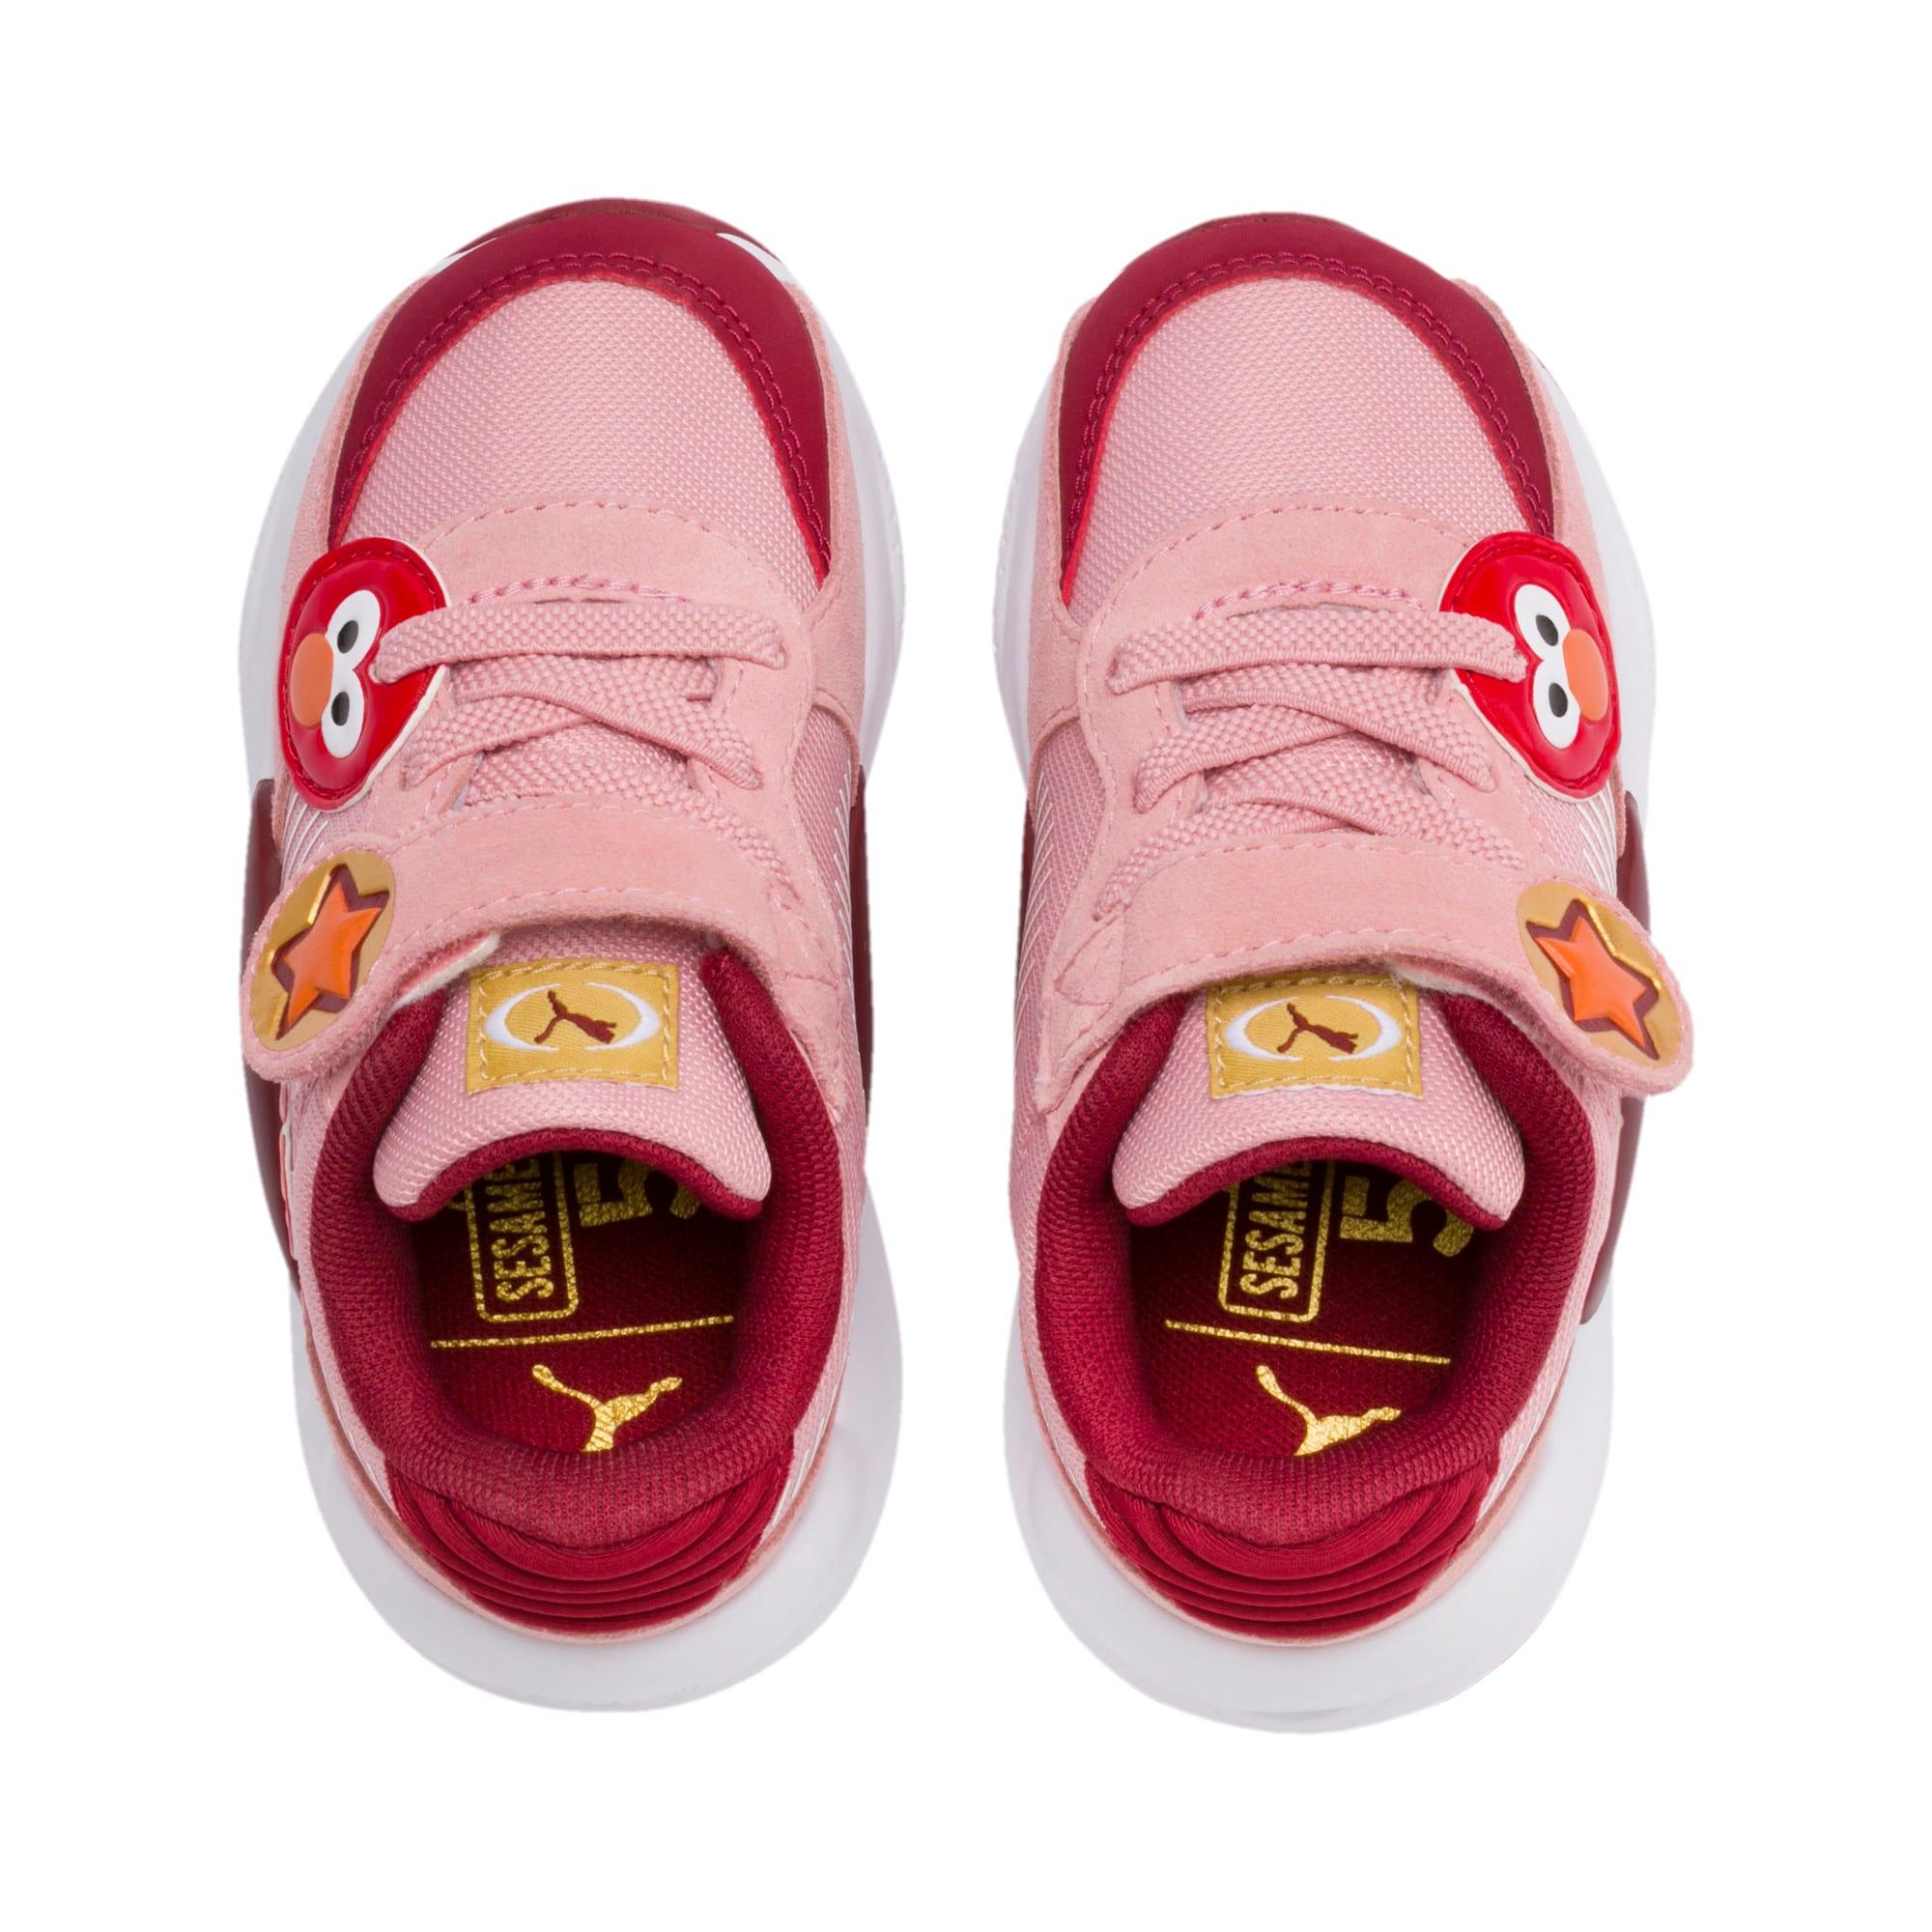 Thumbnail 6 of PUMA x SESAME STREET 50 RS 9.8 Toddler Shoes, Bridal Rose-Rhubarb, medium